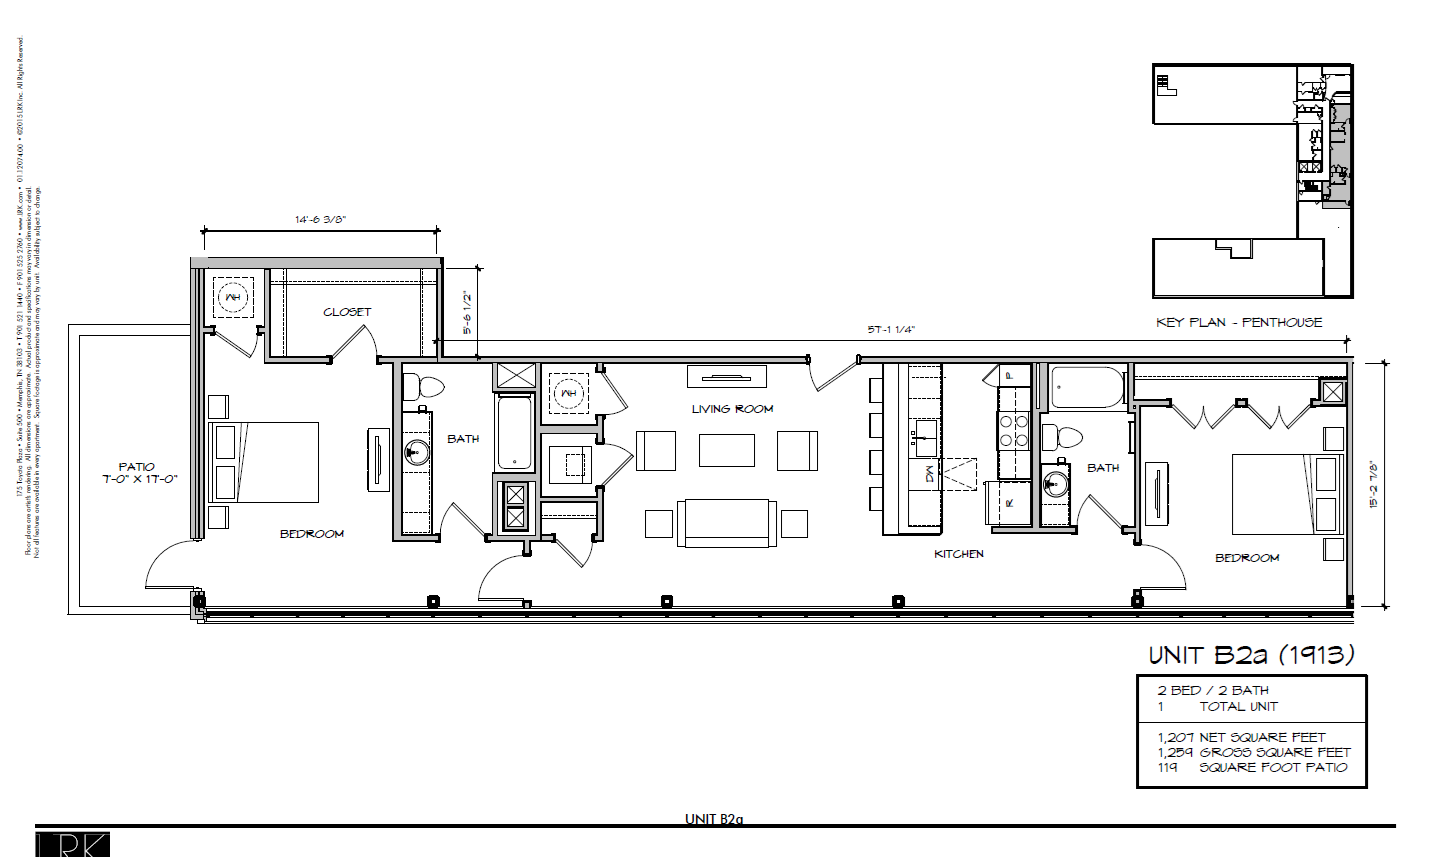 B2a - 1913 Floor Plan 31